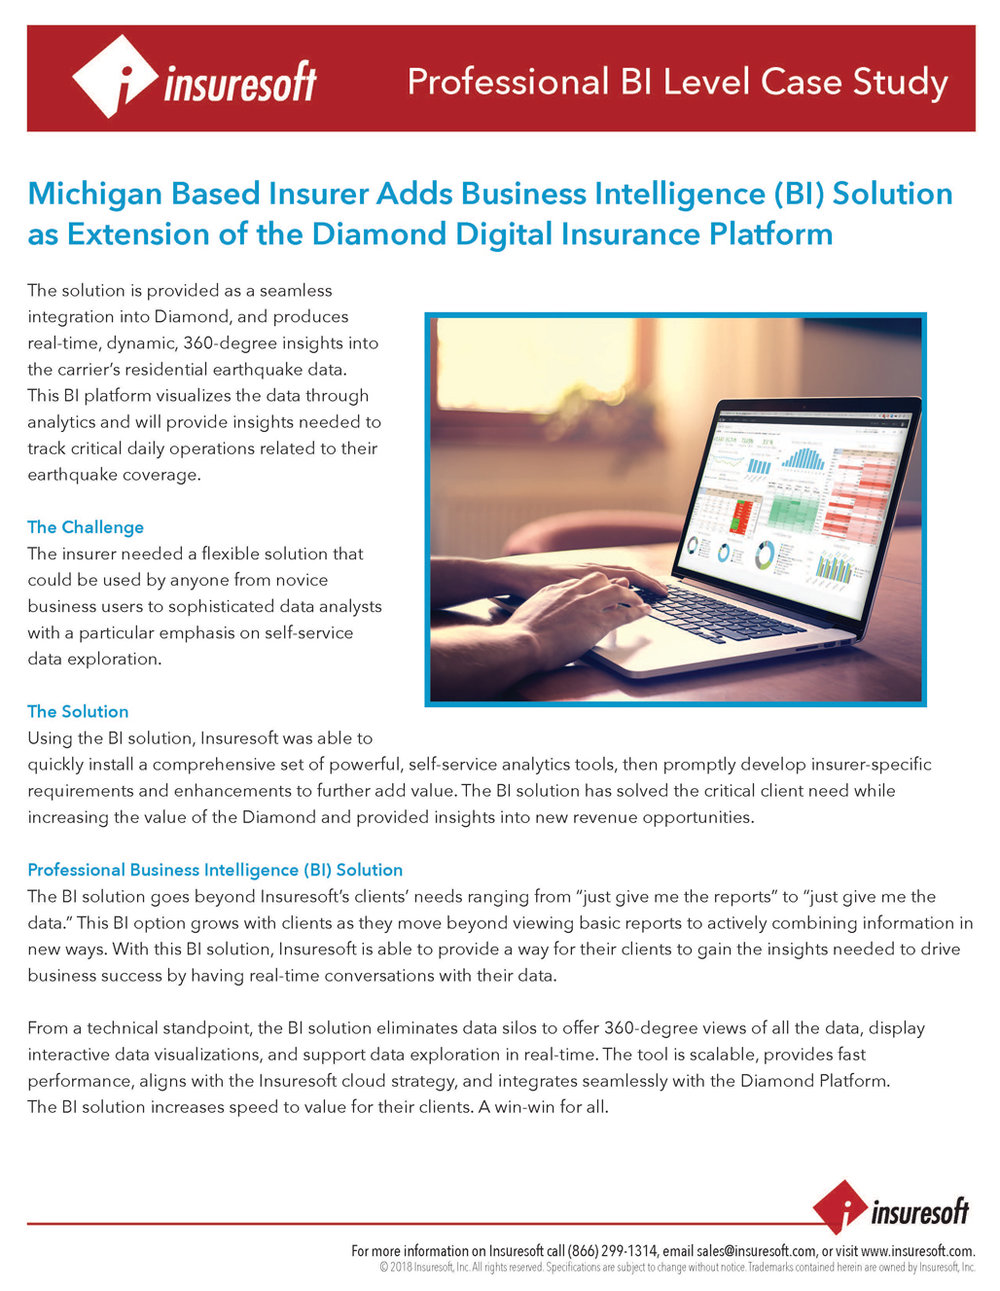 Insuresoft-Professional-Case-Study-BI-2_Page_1.jpg